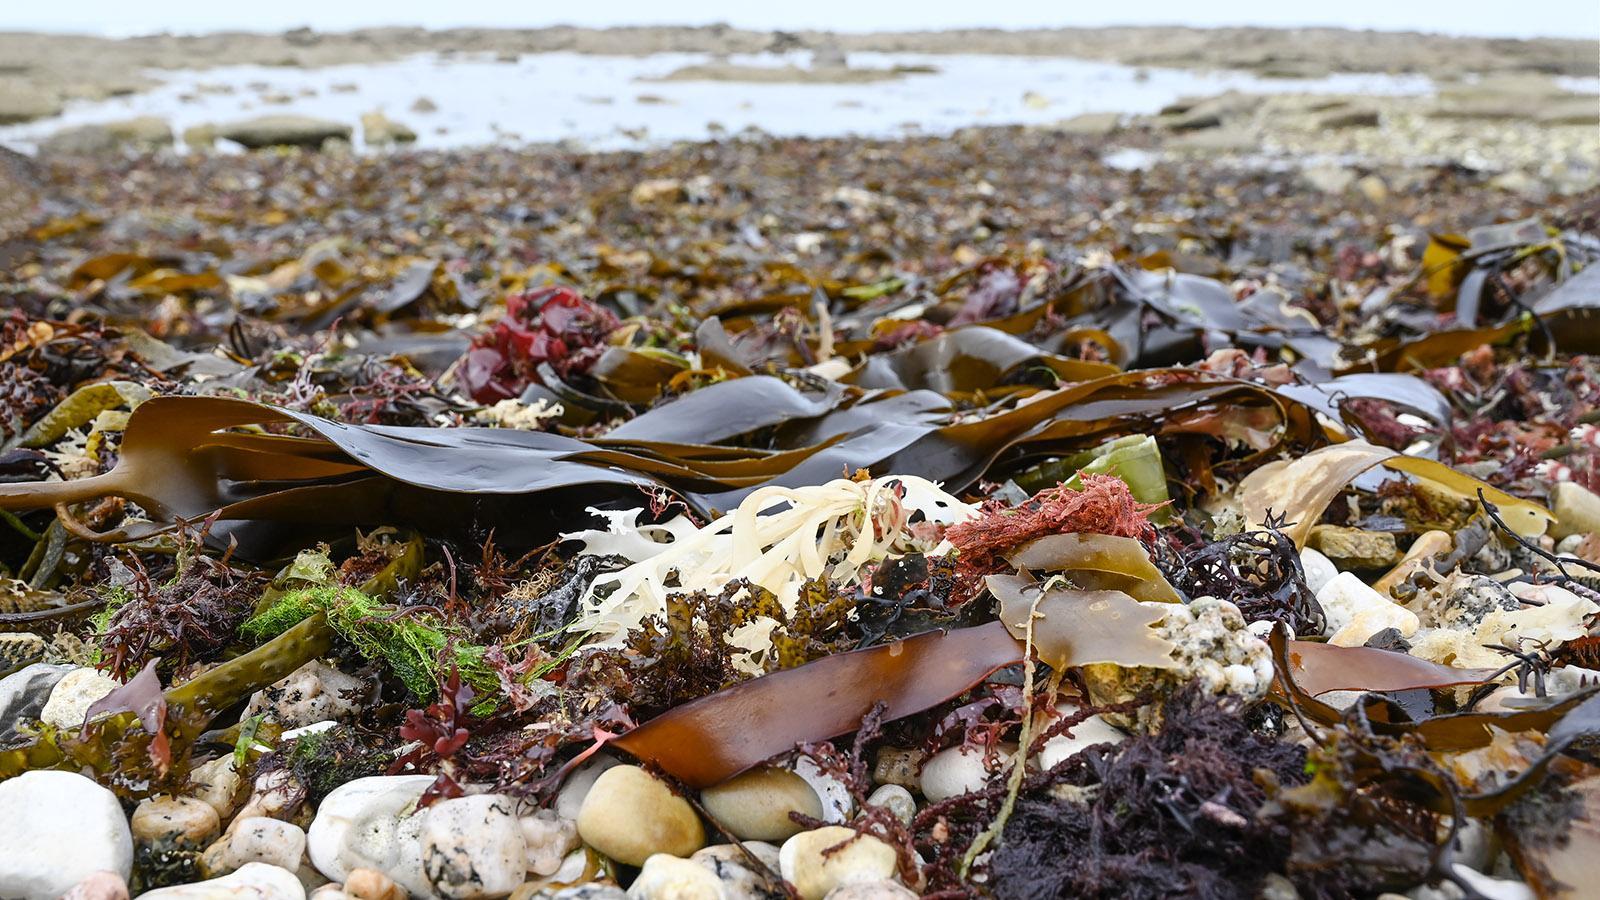 Algen - wertvoller Rohstoff aus dem Atlantik. Foto. Hilke Maunder